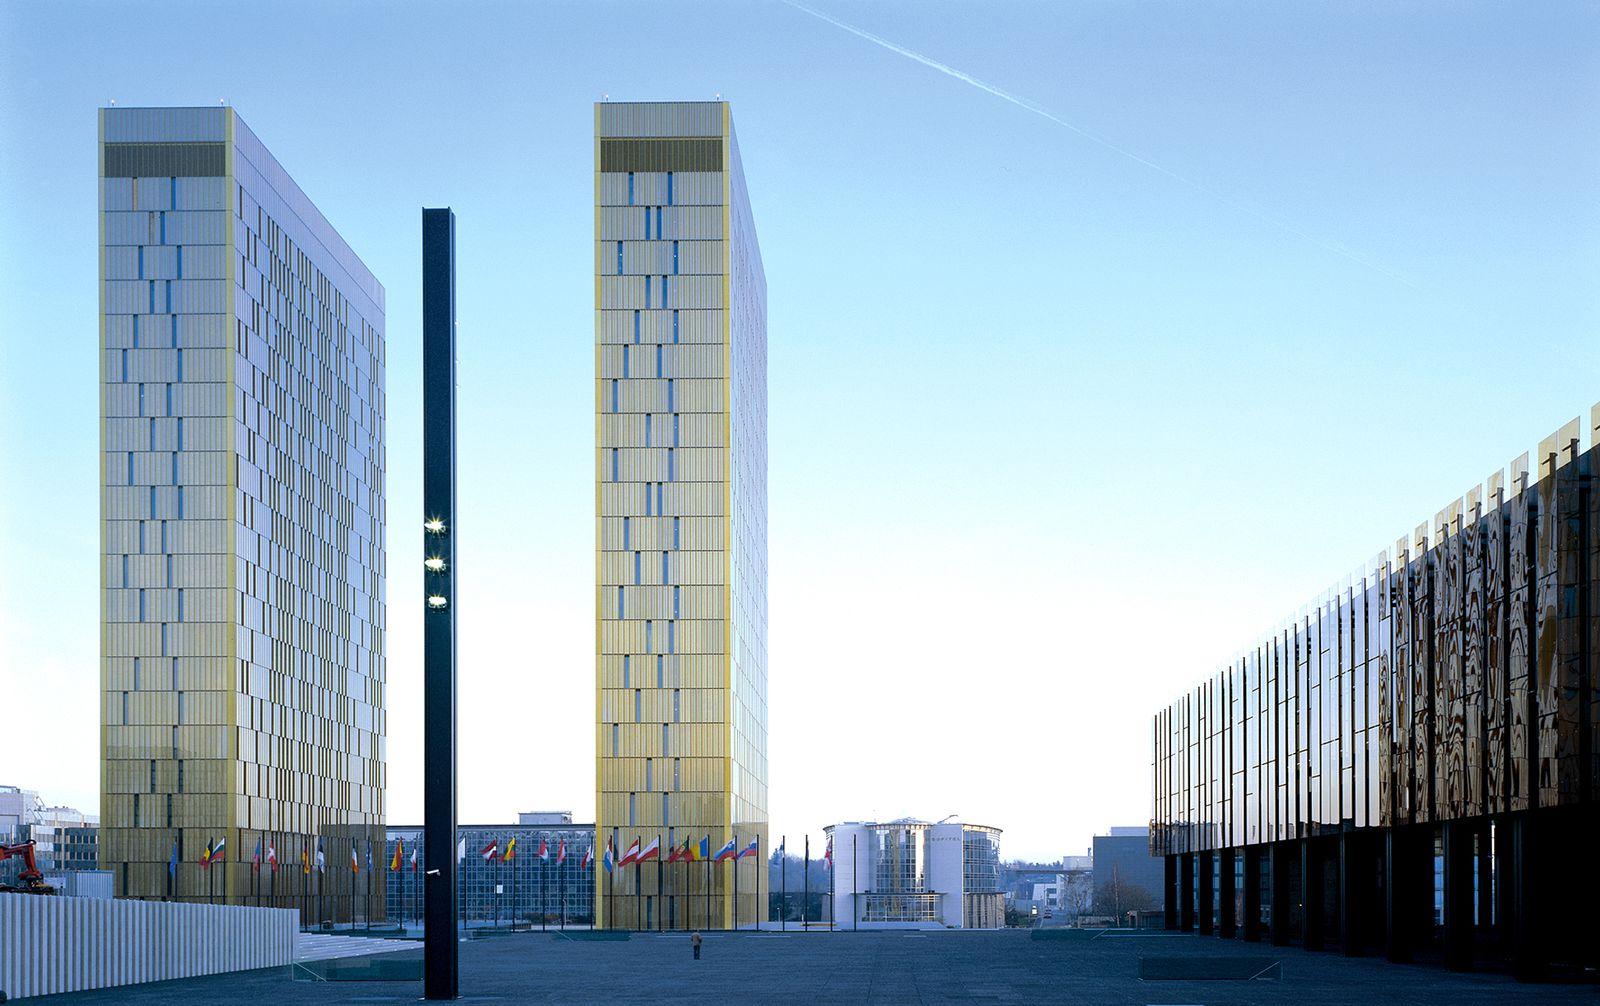 Europischer Gerichtshof (EuGH) in Luxemburg